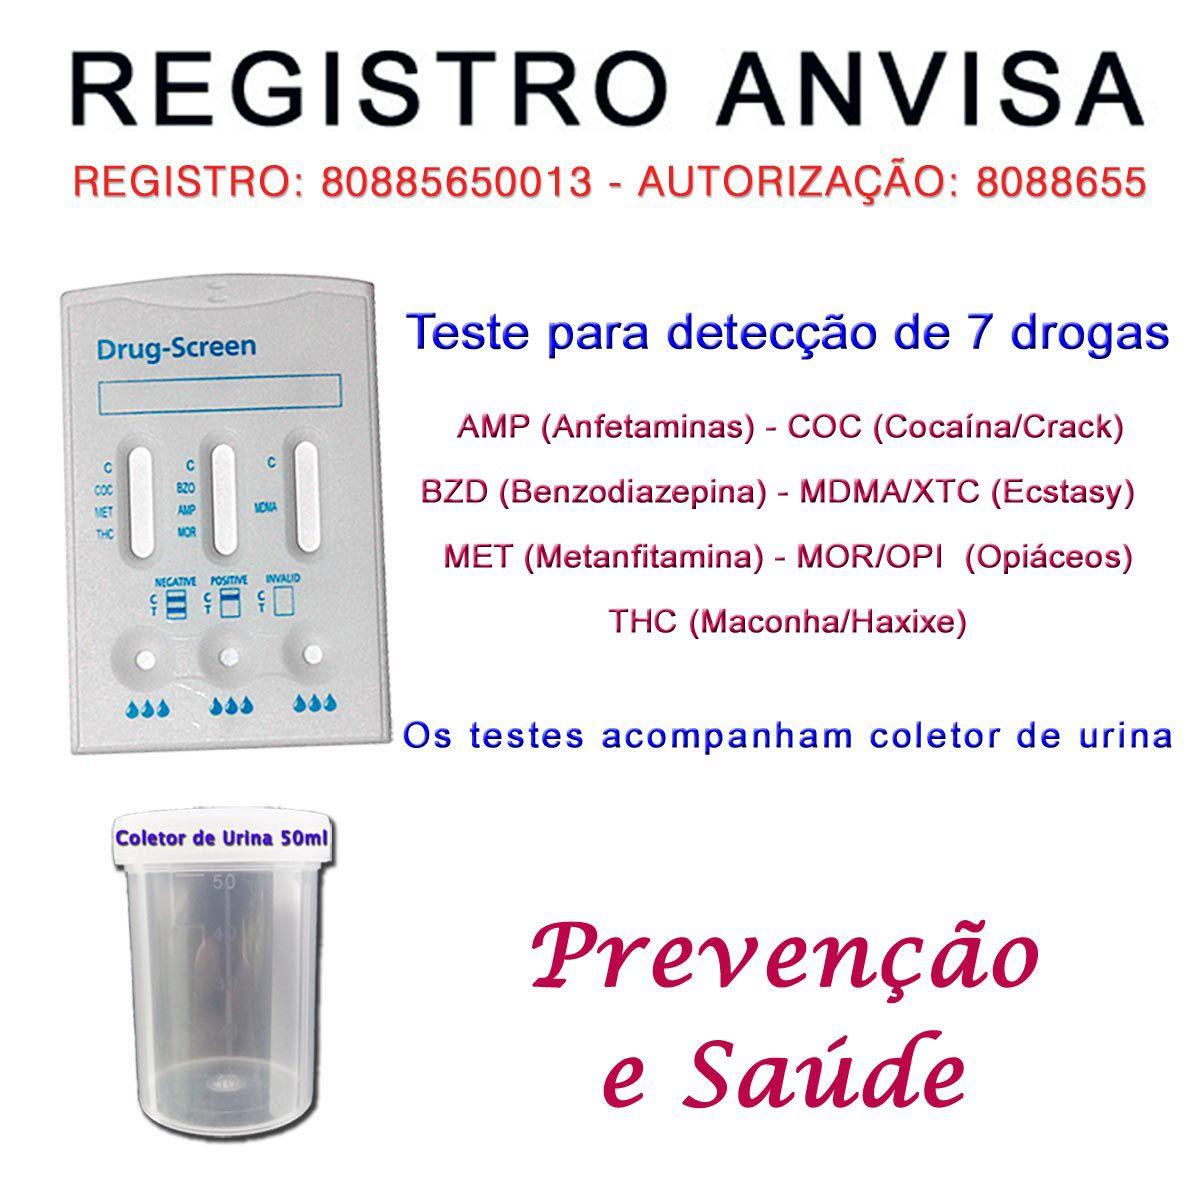 25 Kits para testes de 7 substâncias  - Testes Para Drogas e Parar de Beber e Fumar